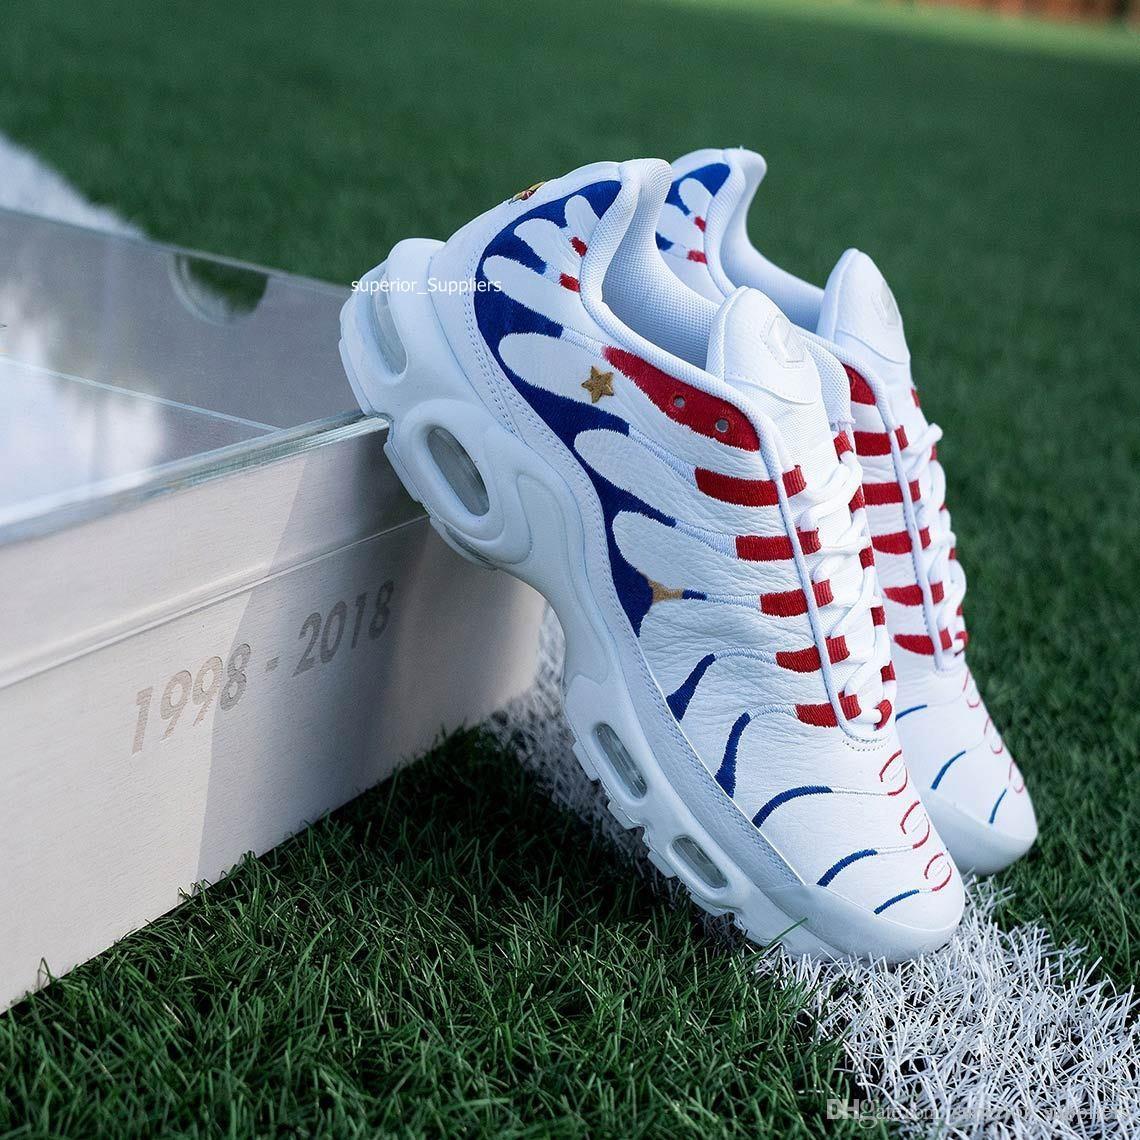 online store 43eb0 8c148 Acheter Nike Air Max TN Nouveau 2018 Marque Sport Hommes Chaussures New Air  Coussin TN Pour Hommes Noir Blanc Rouge Hommes Runner Sneakers Homme  Trainers ...